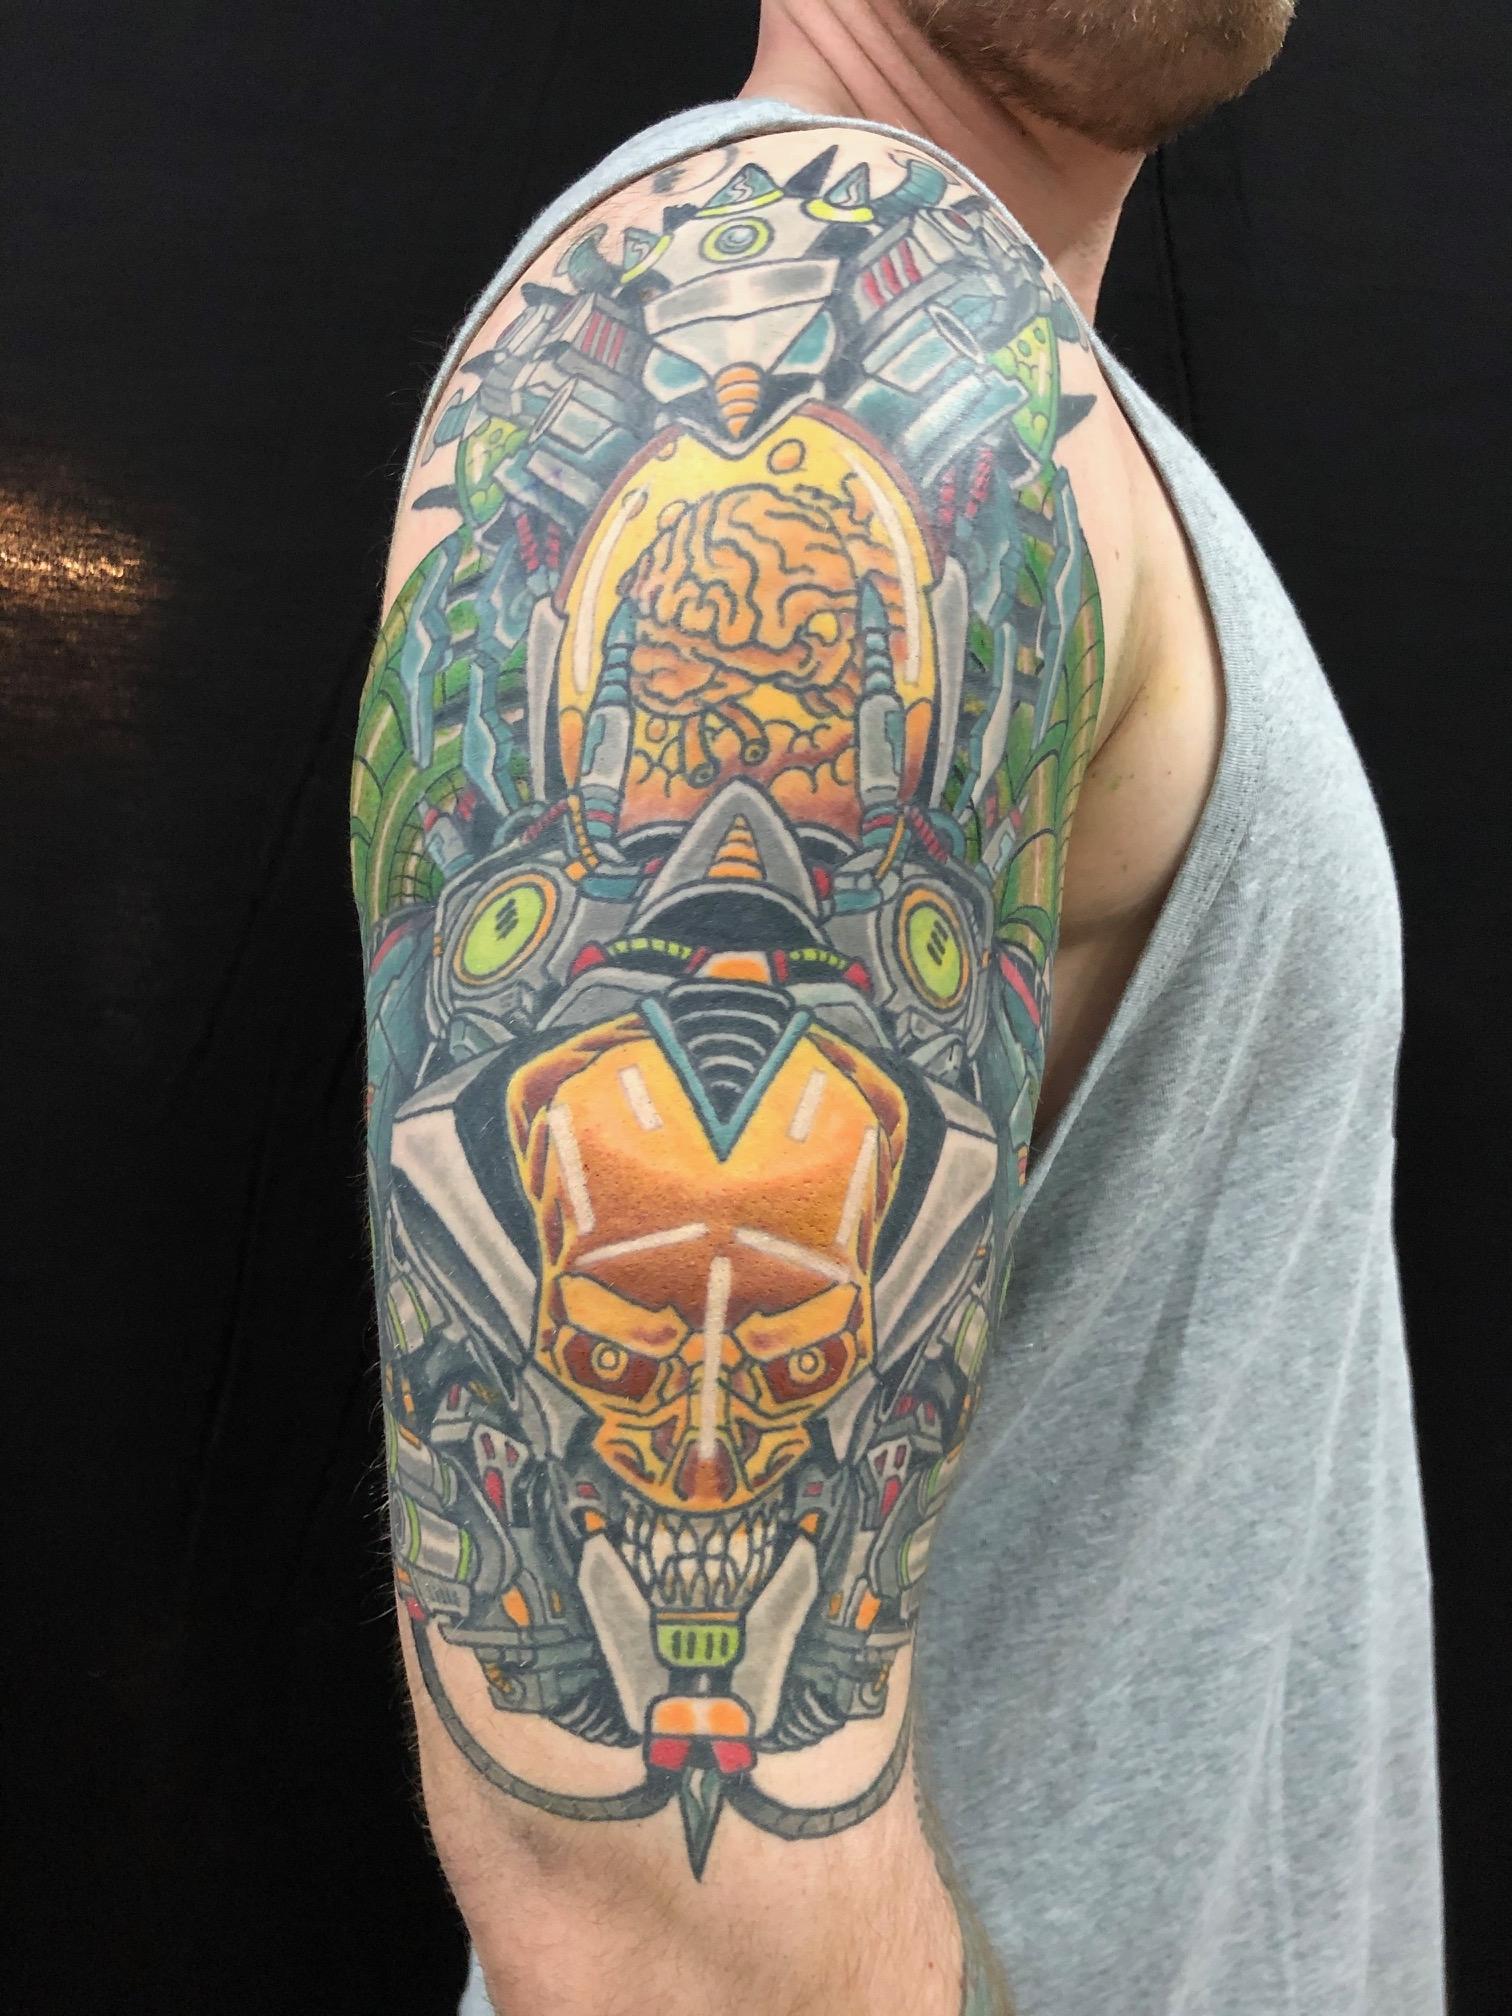 Inksearch tattoo Bernhard Mitteregger